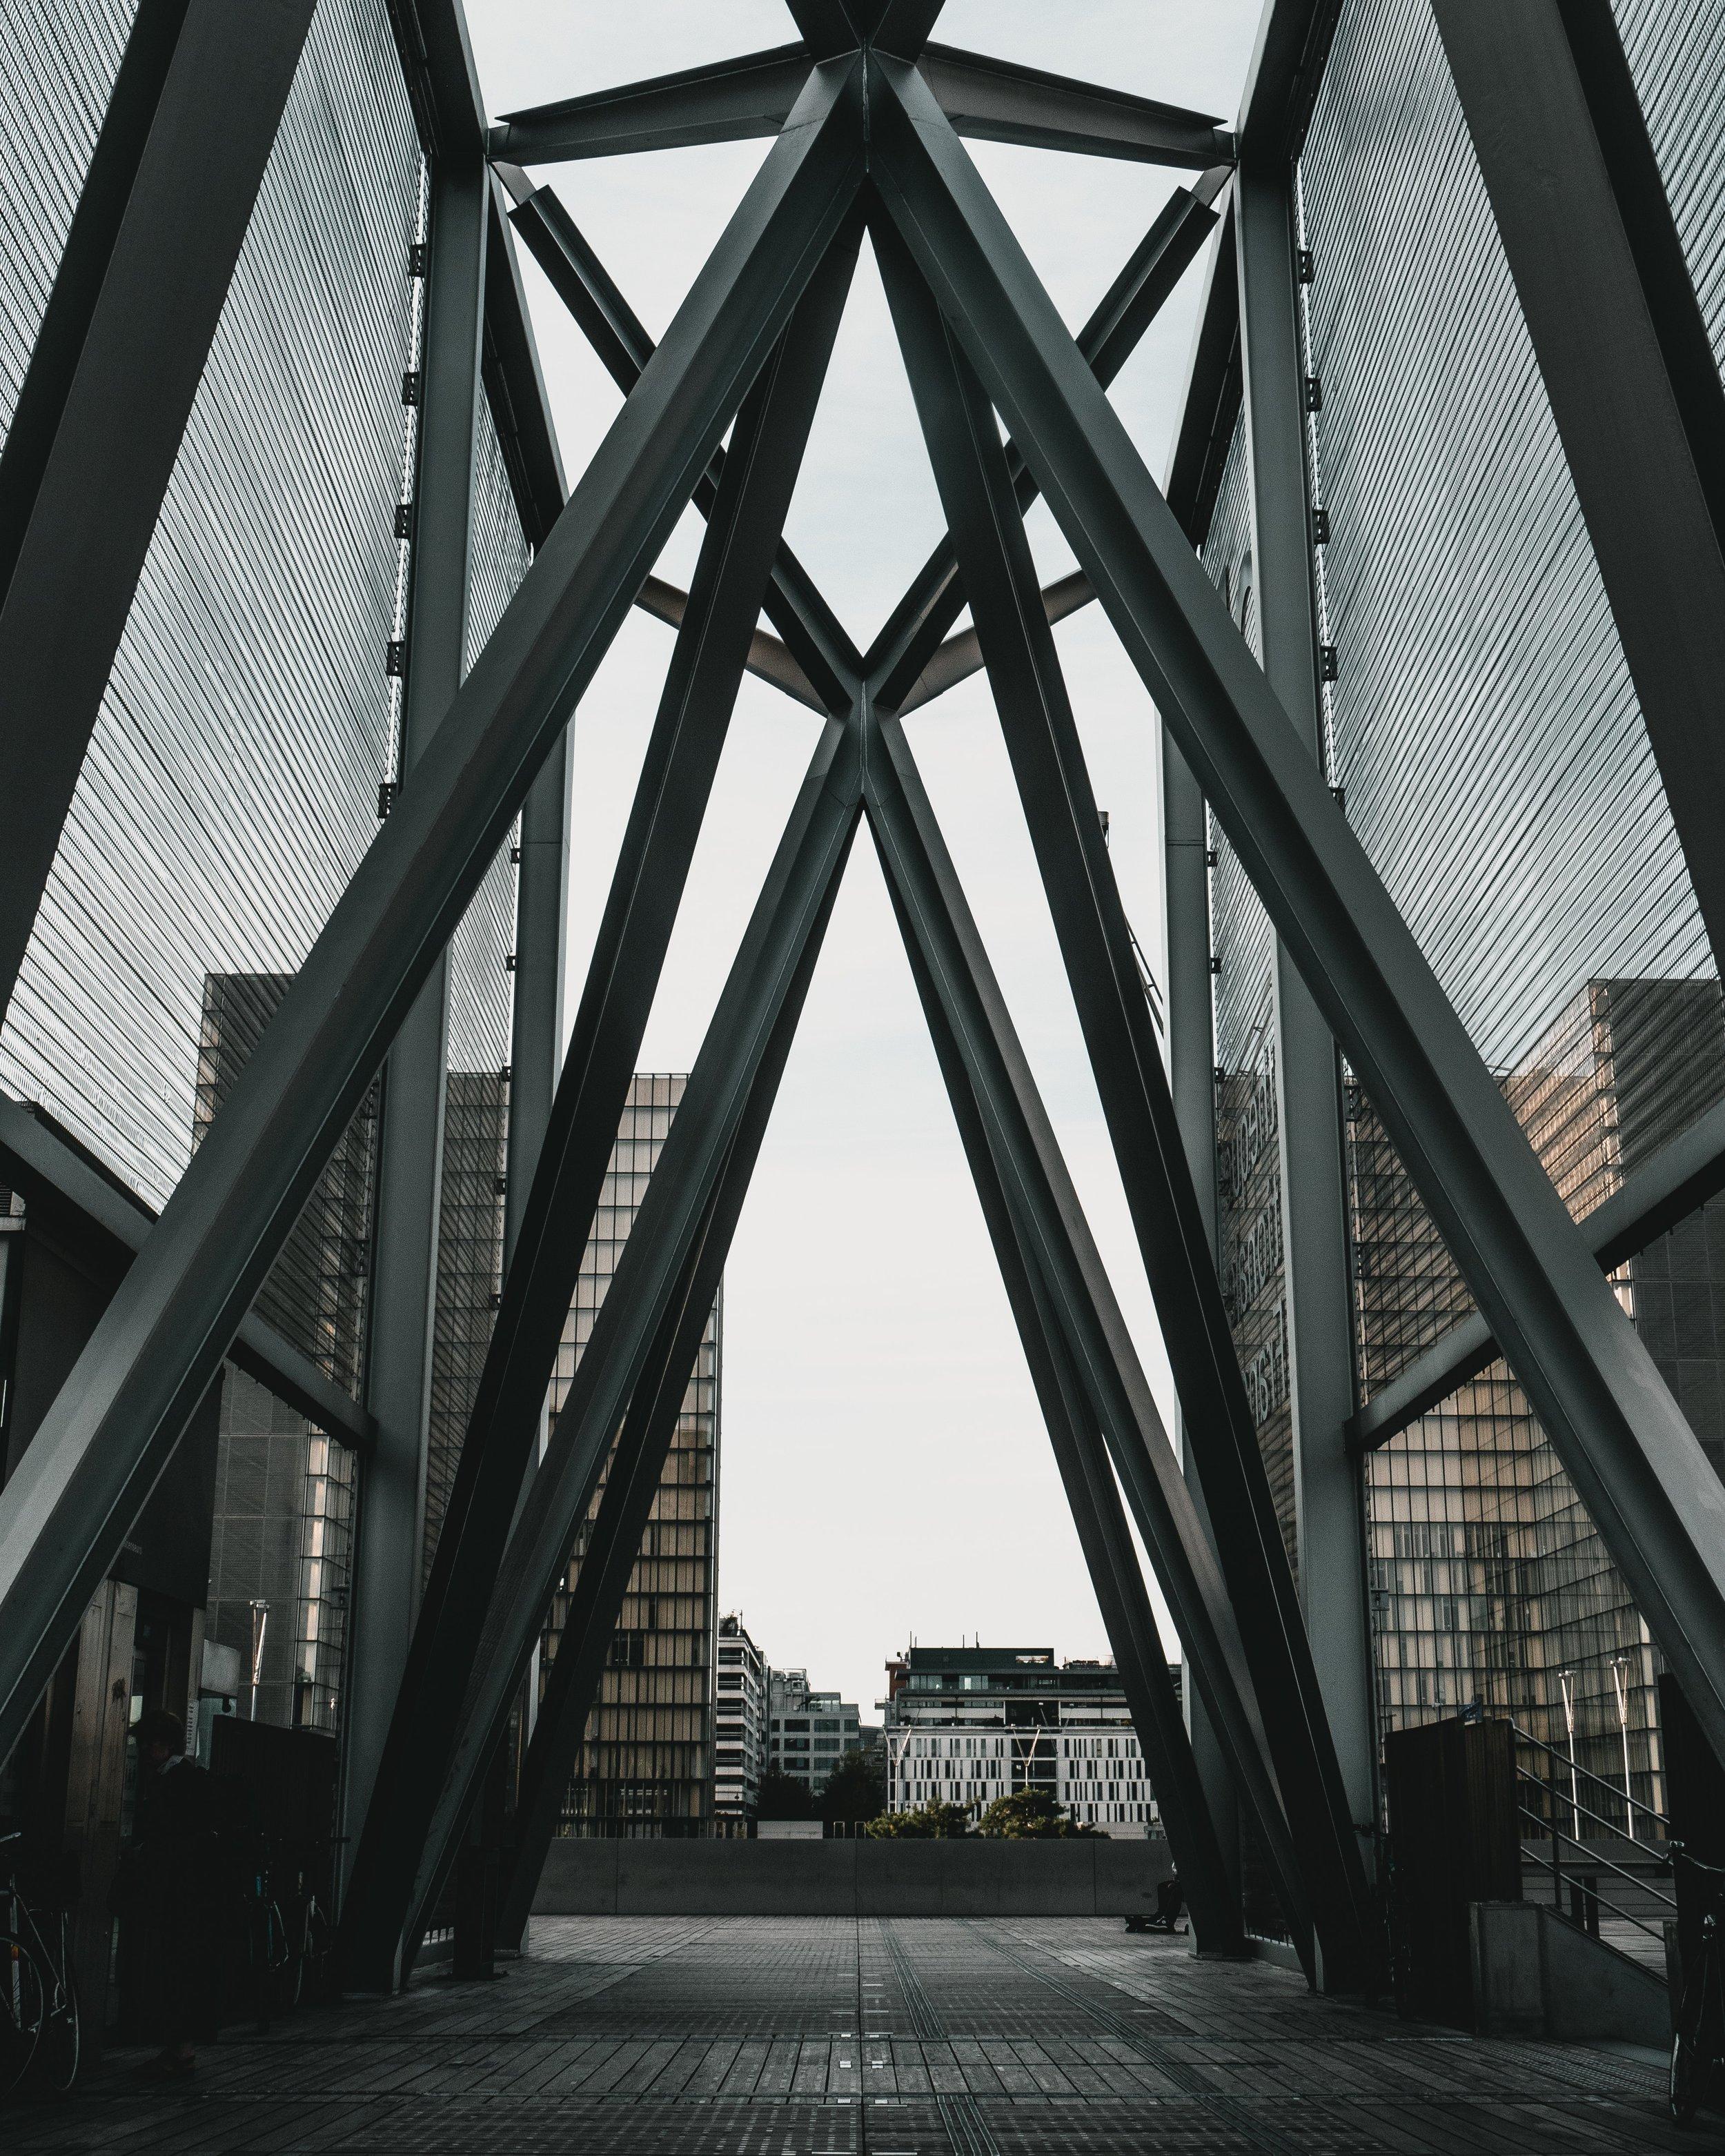 architectural-design-architecture-buildings-2210292.jpg